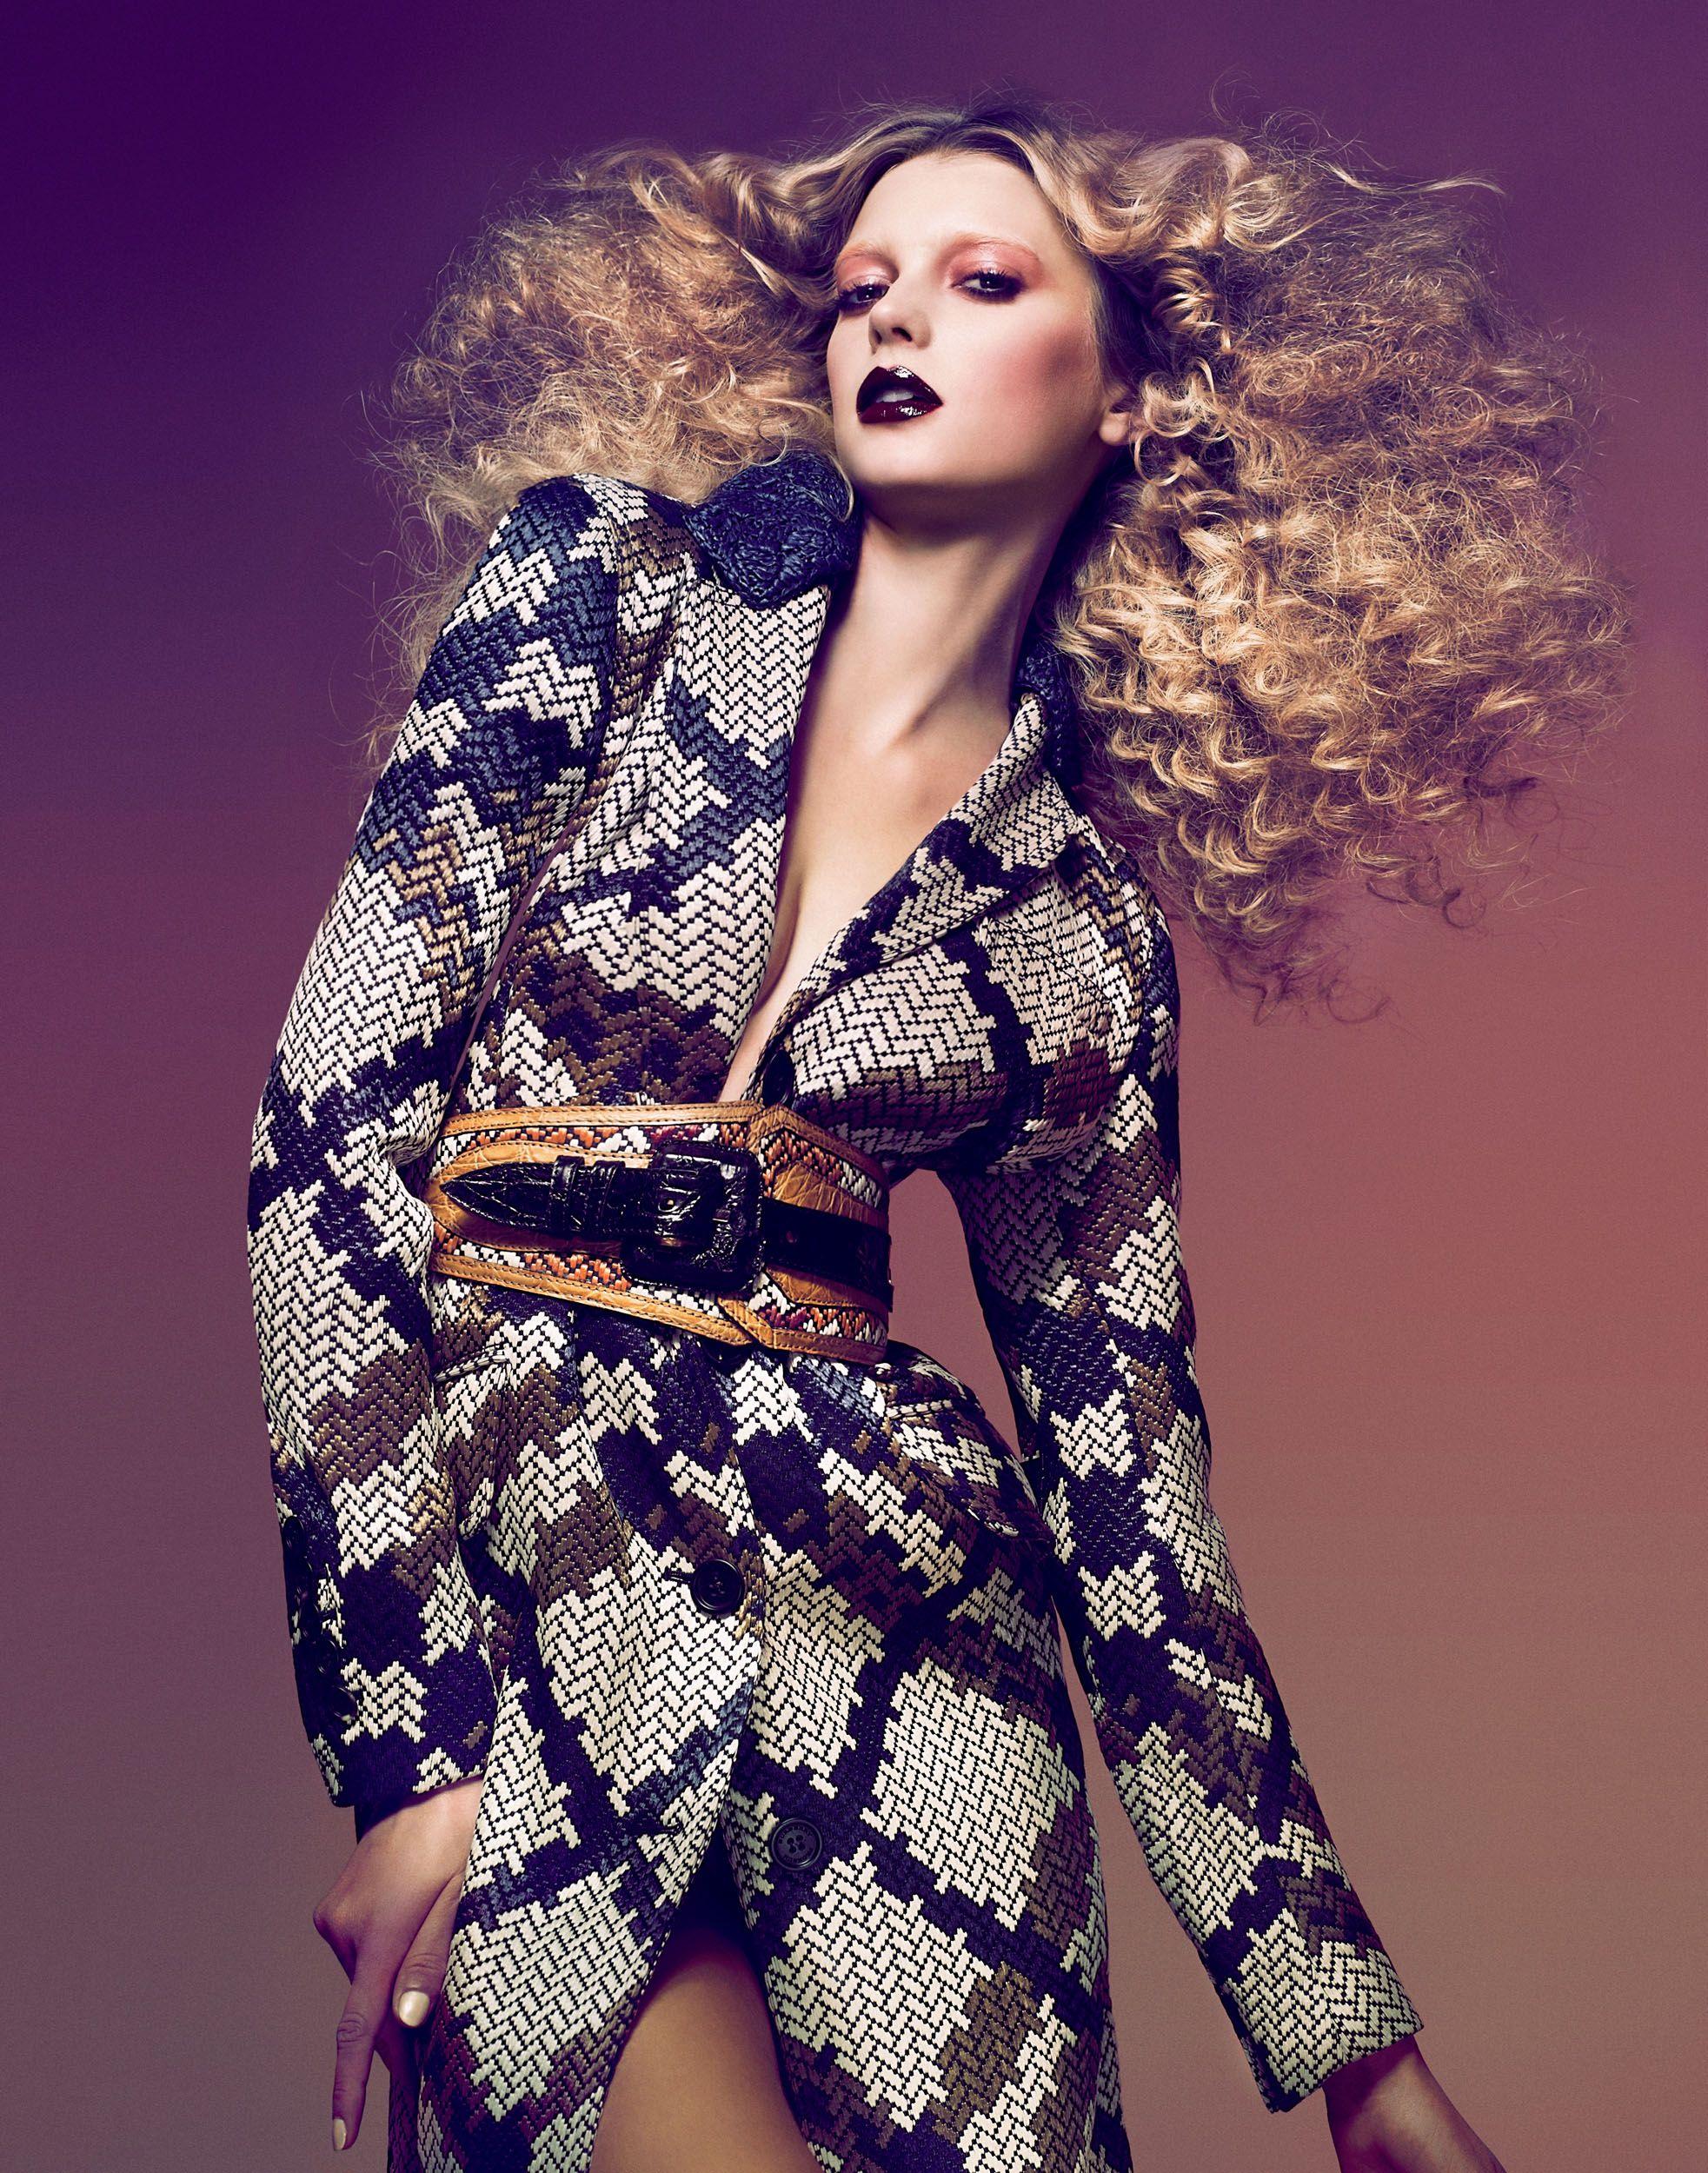 fashion magazi tucker takes - HD943×1200